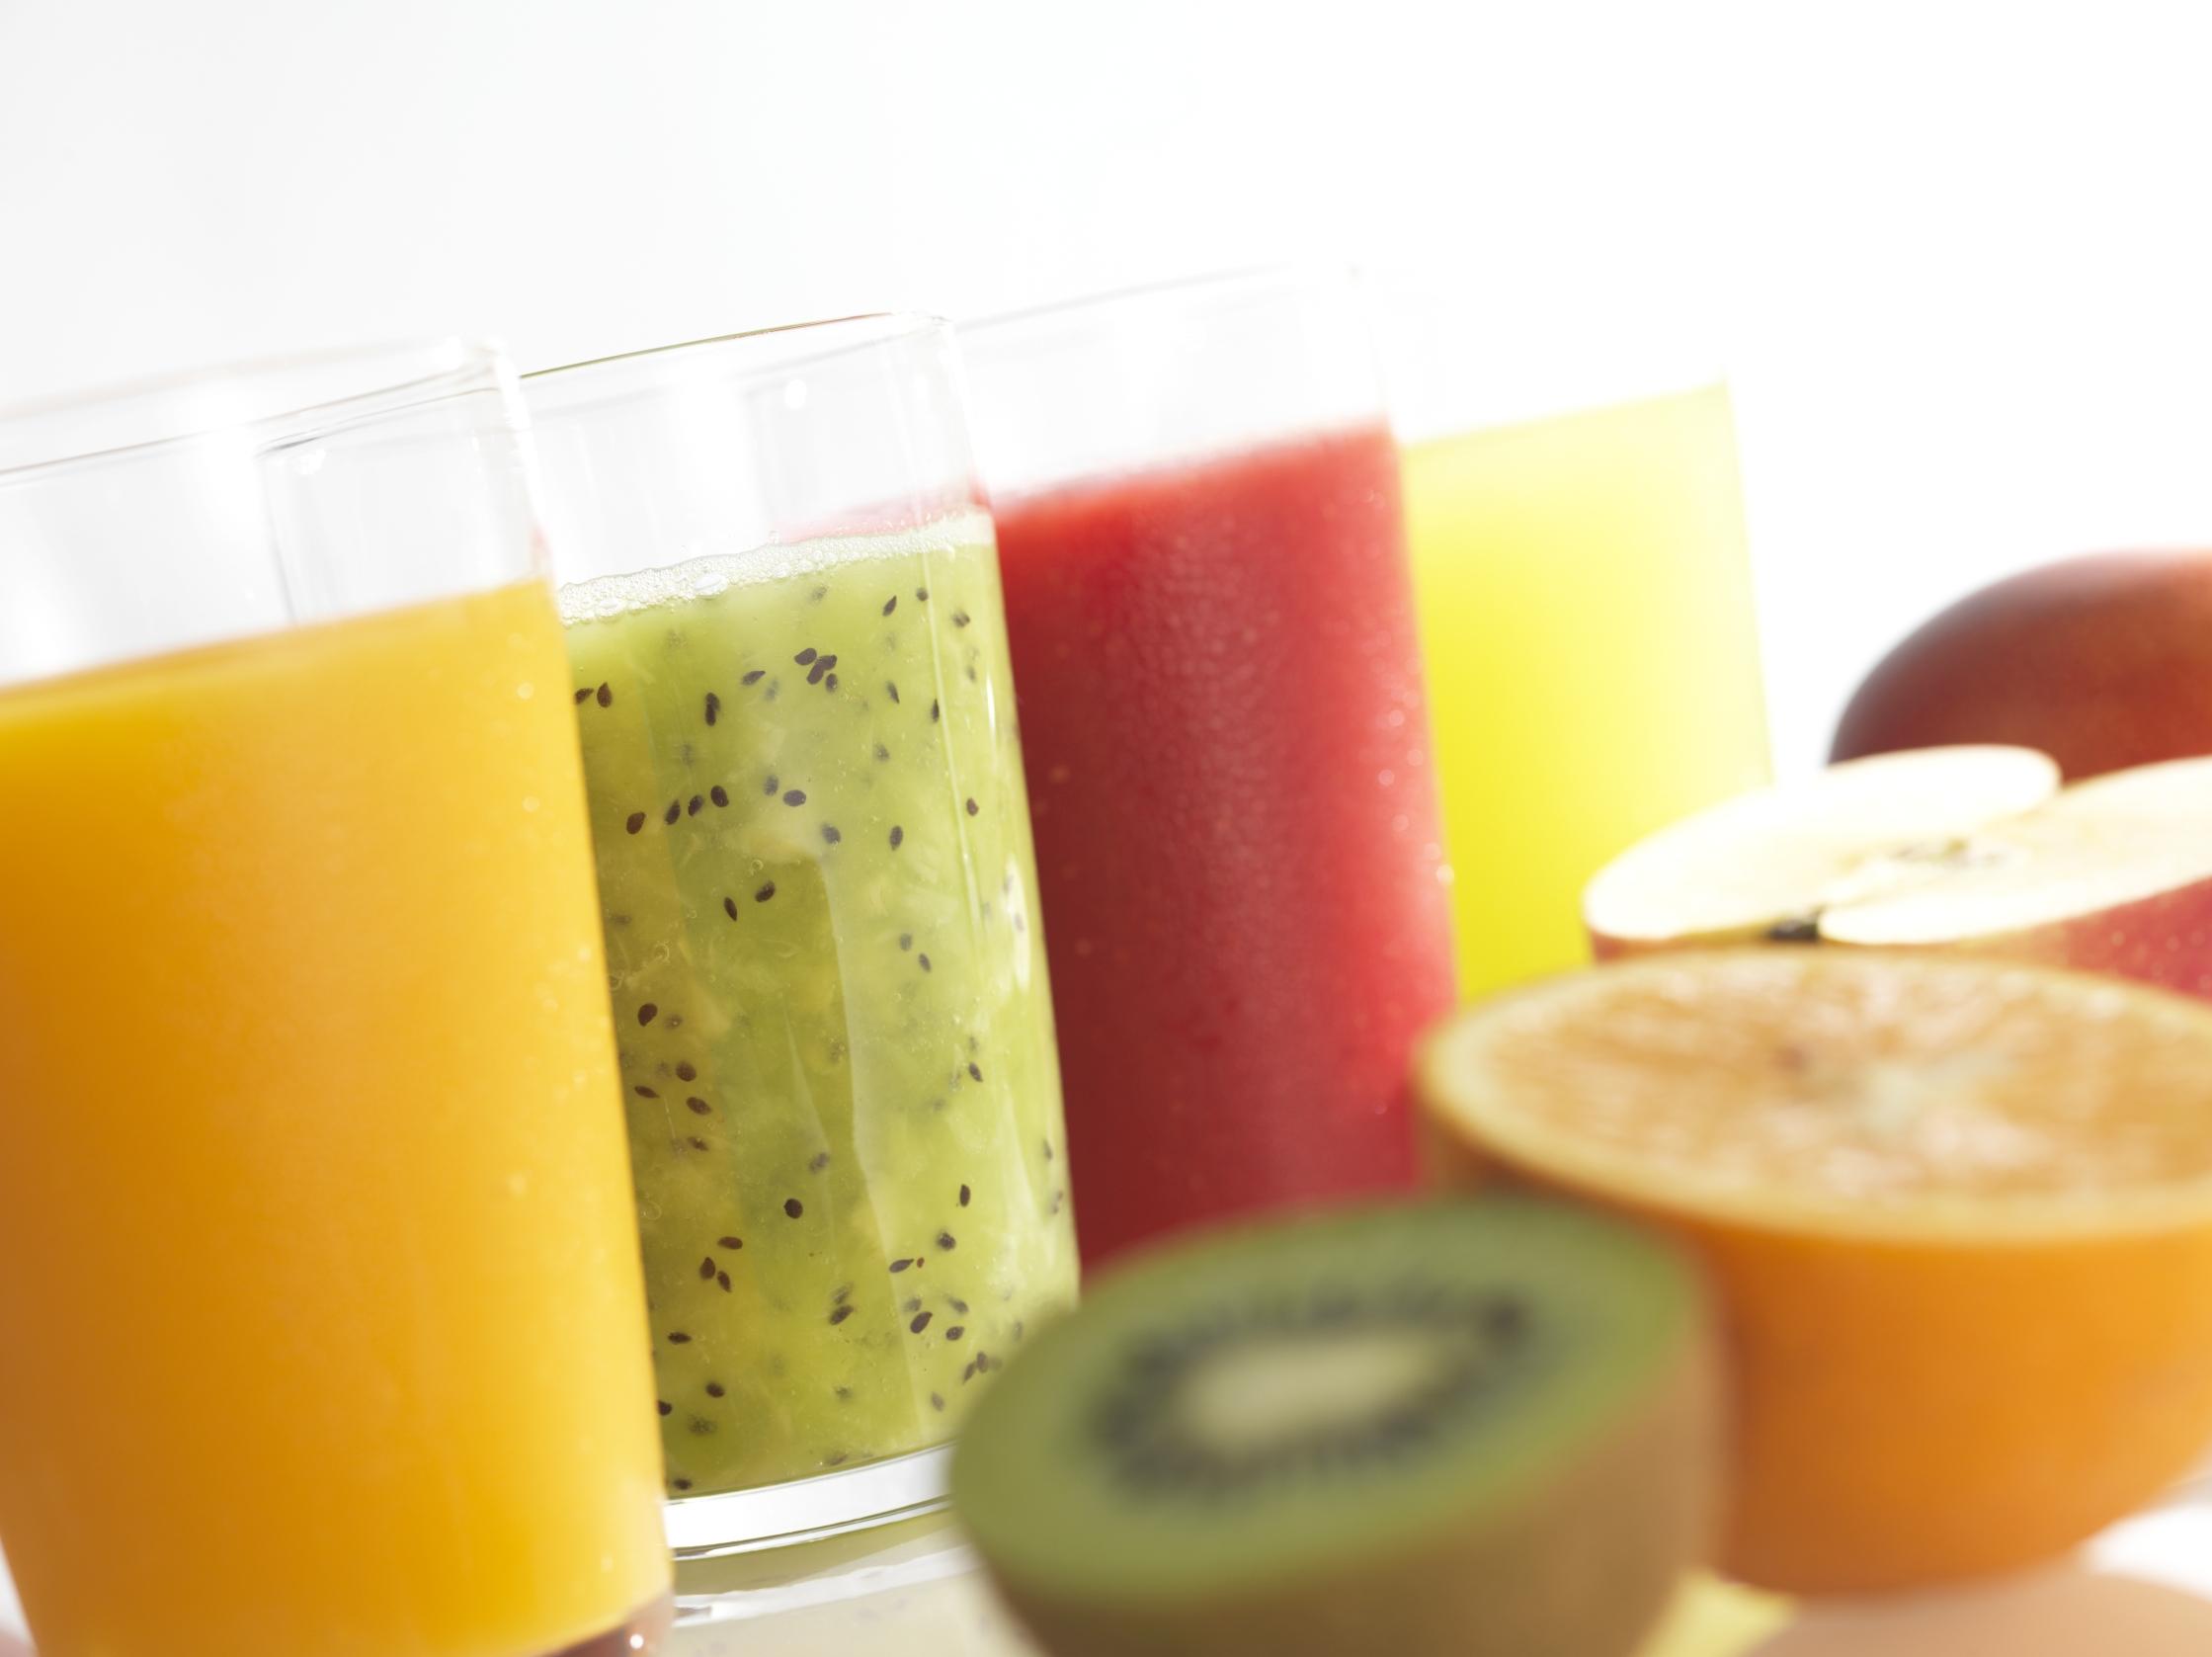 果汁工房 果琳の画像